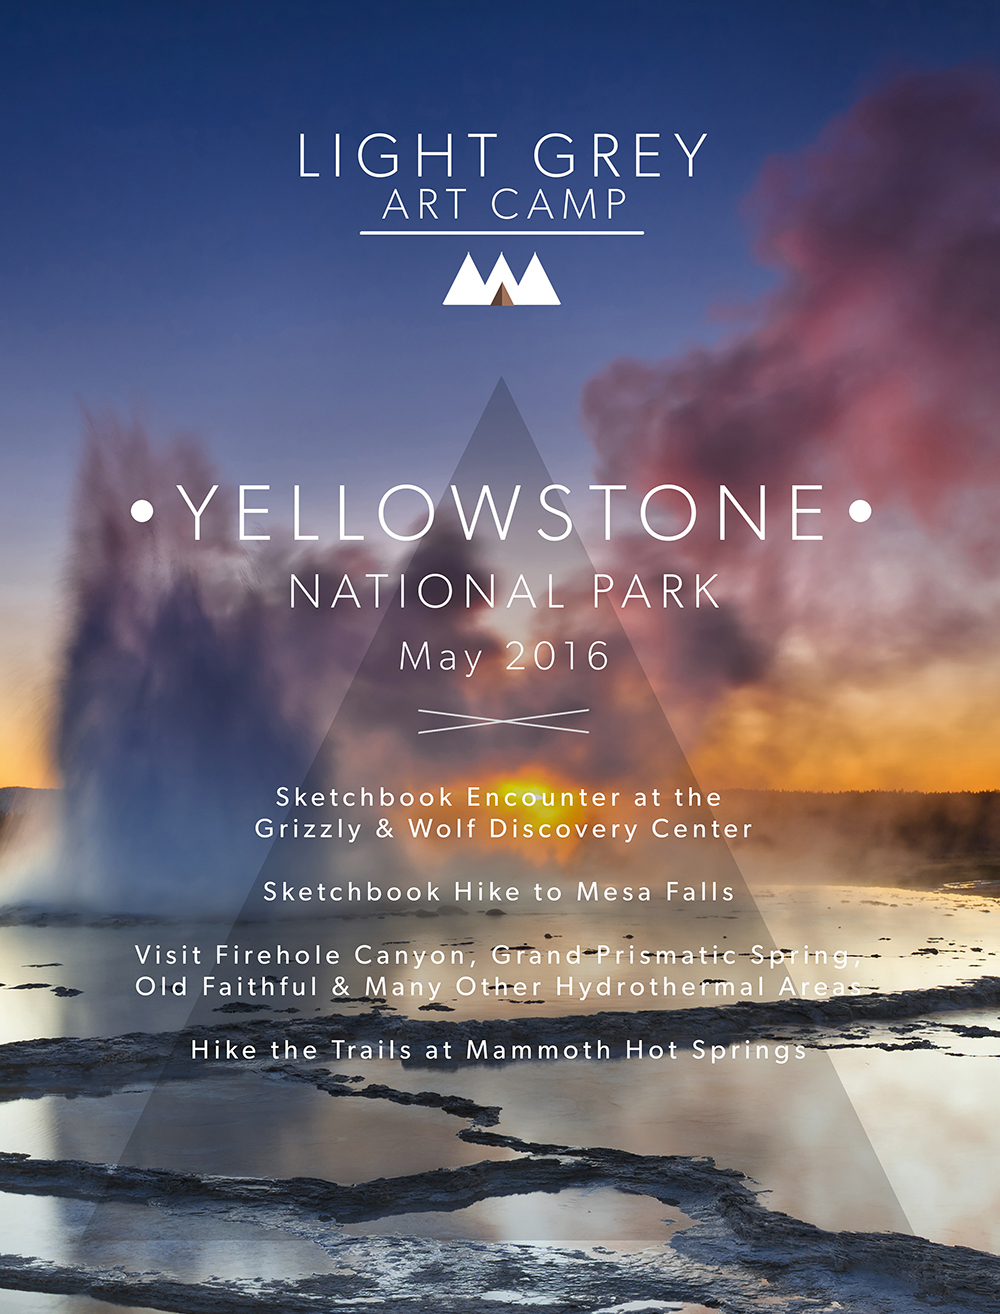 LightGreyArtCamp_Yellowstone_small.jpg